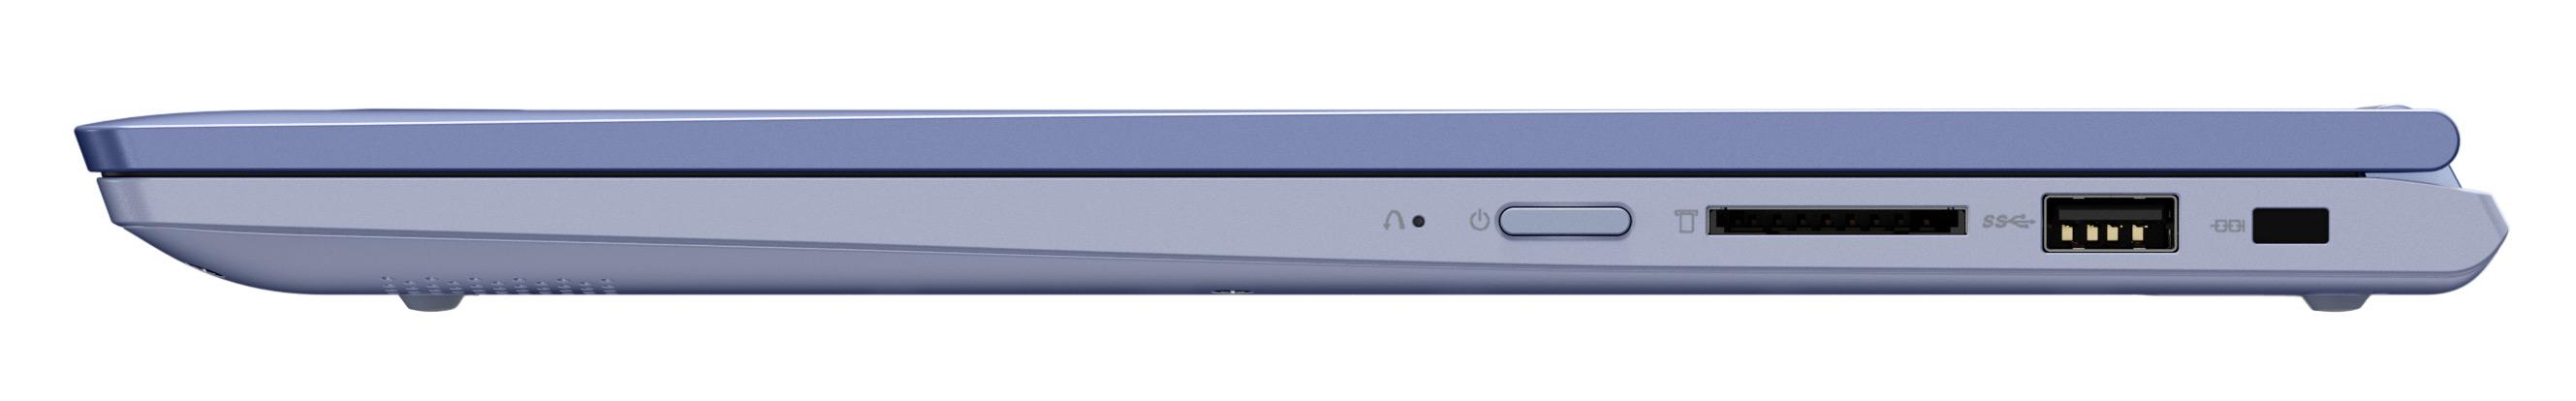 Фото  Ультрабук Lenovo Yoga 530 Liquid Blue (81EK00L6RA)